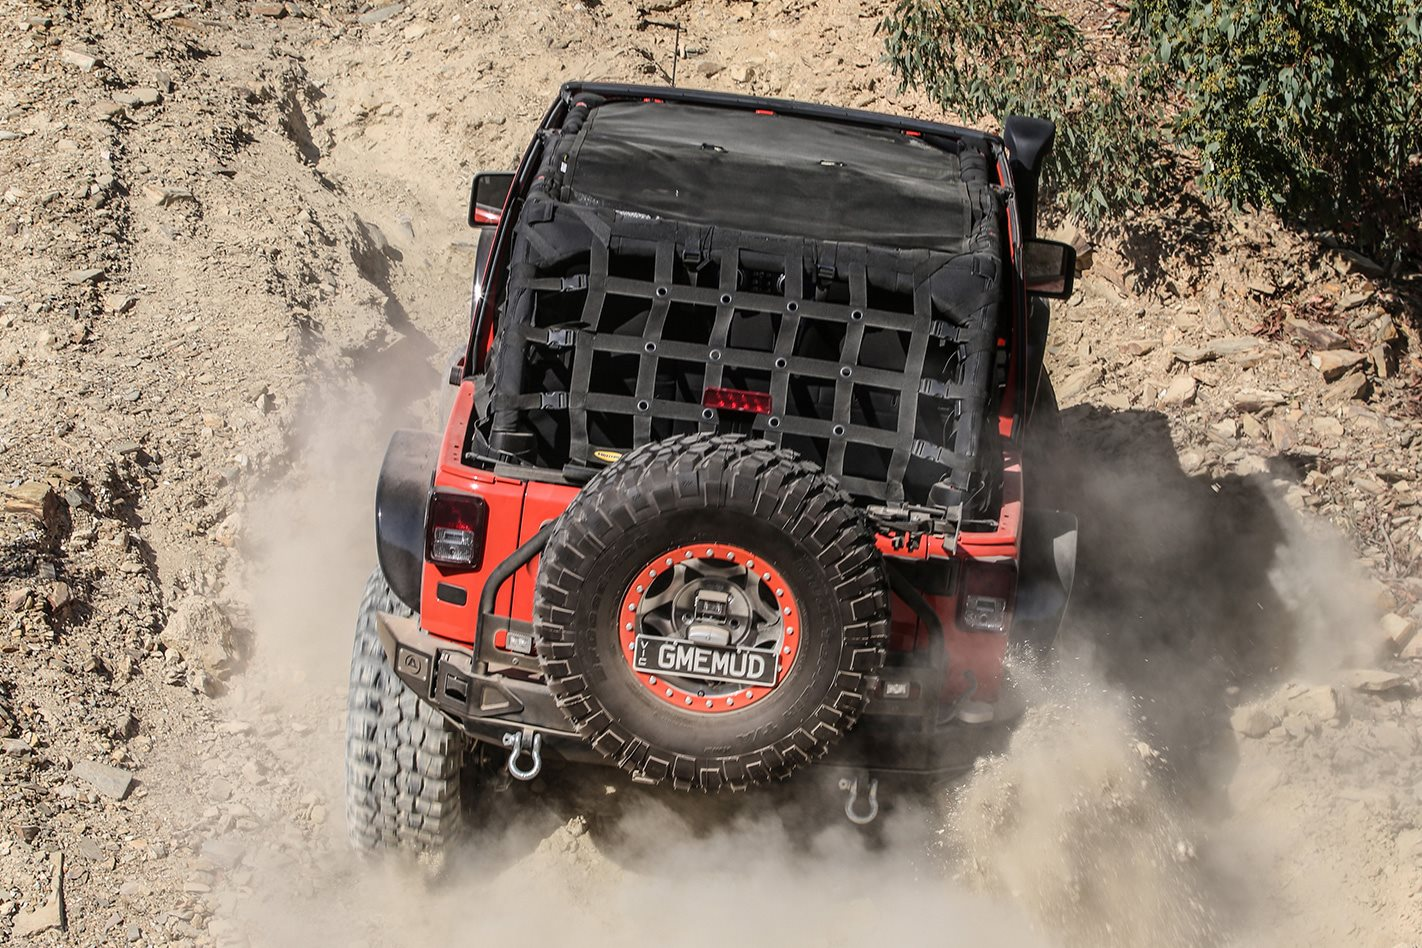 Custom-Jeep-JK-Wrangler-Rubicon-offroading.jpg